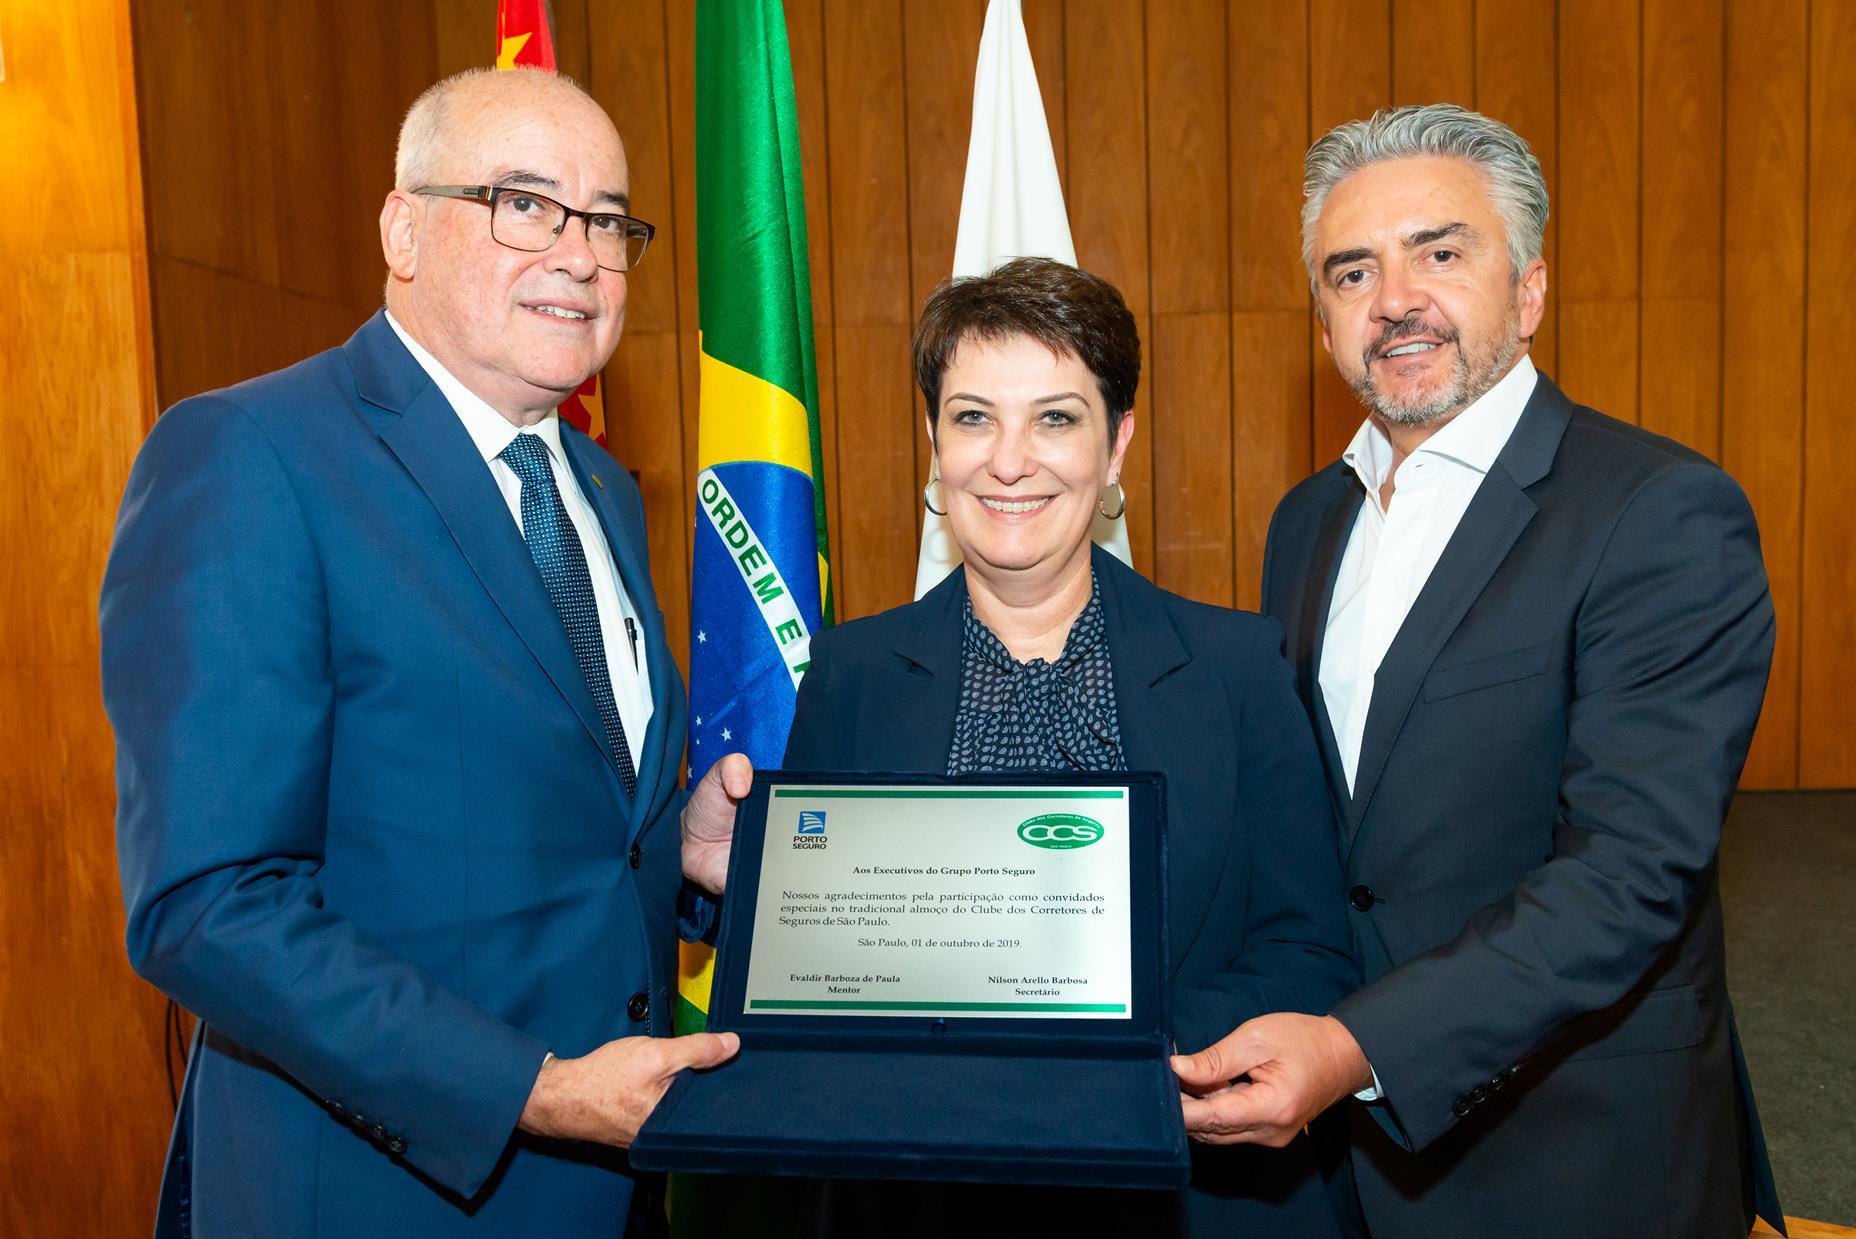 Evaldir Barboza de Paula, Eva Miguel e Rivaldo Leite / Fotos: Antranik Photos